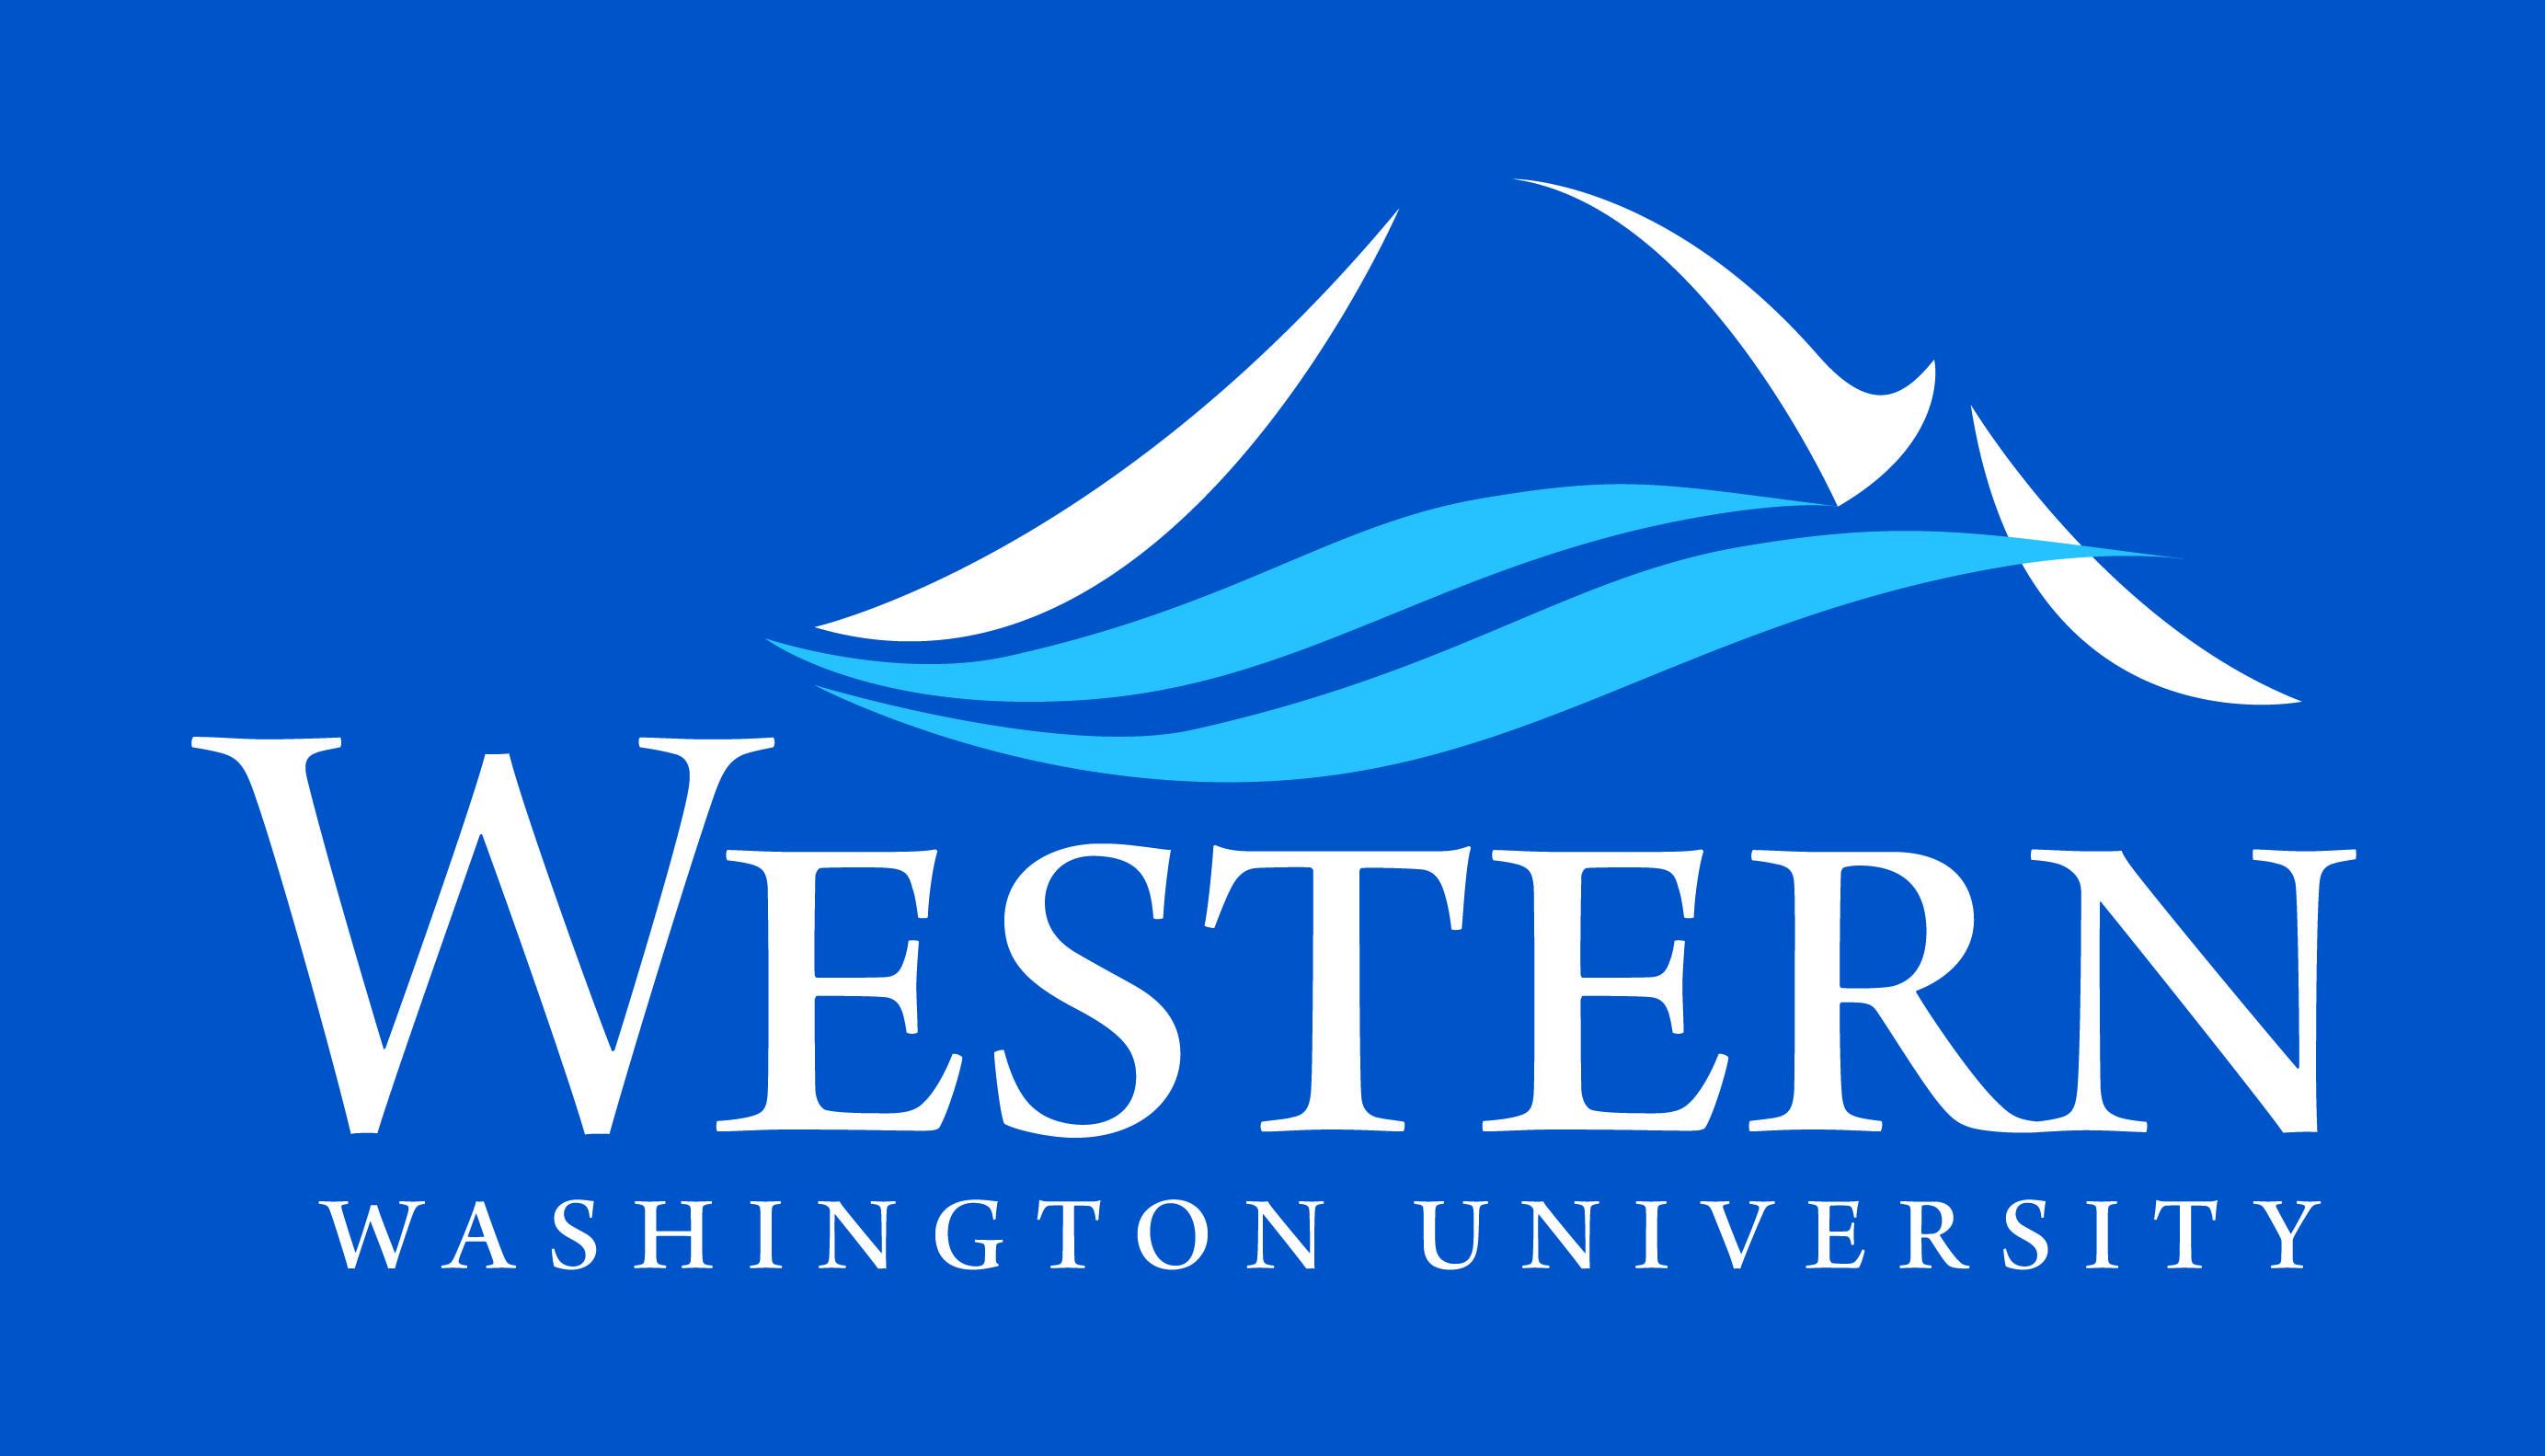 alt - США, Western Washington University, WMU, Бакалавриат,Магистратура, 1